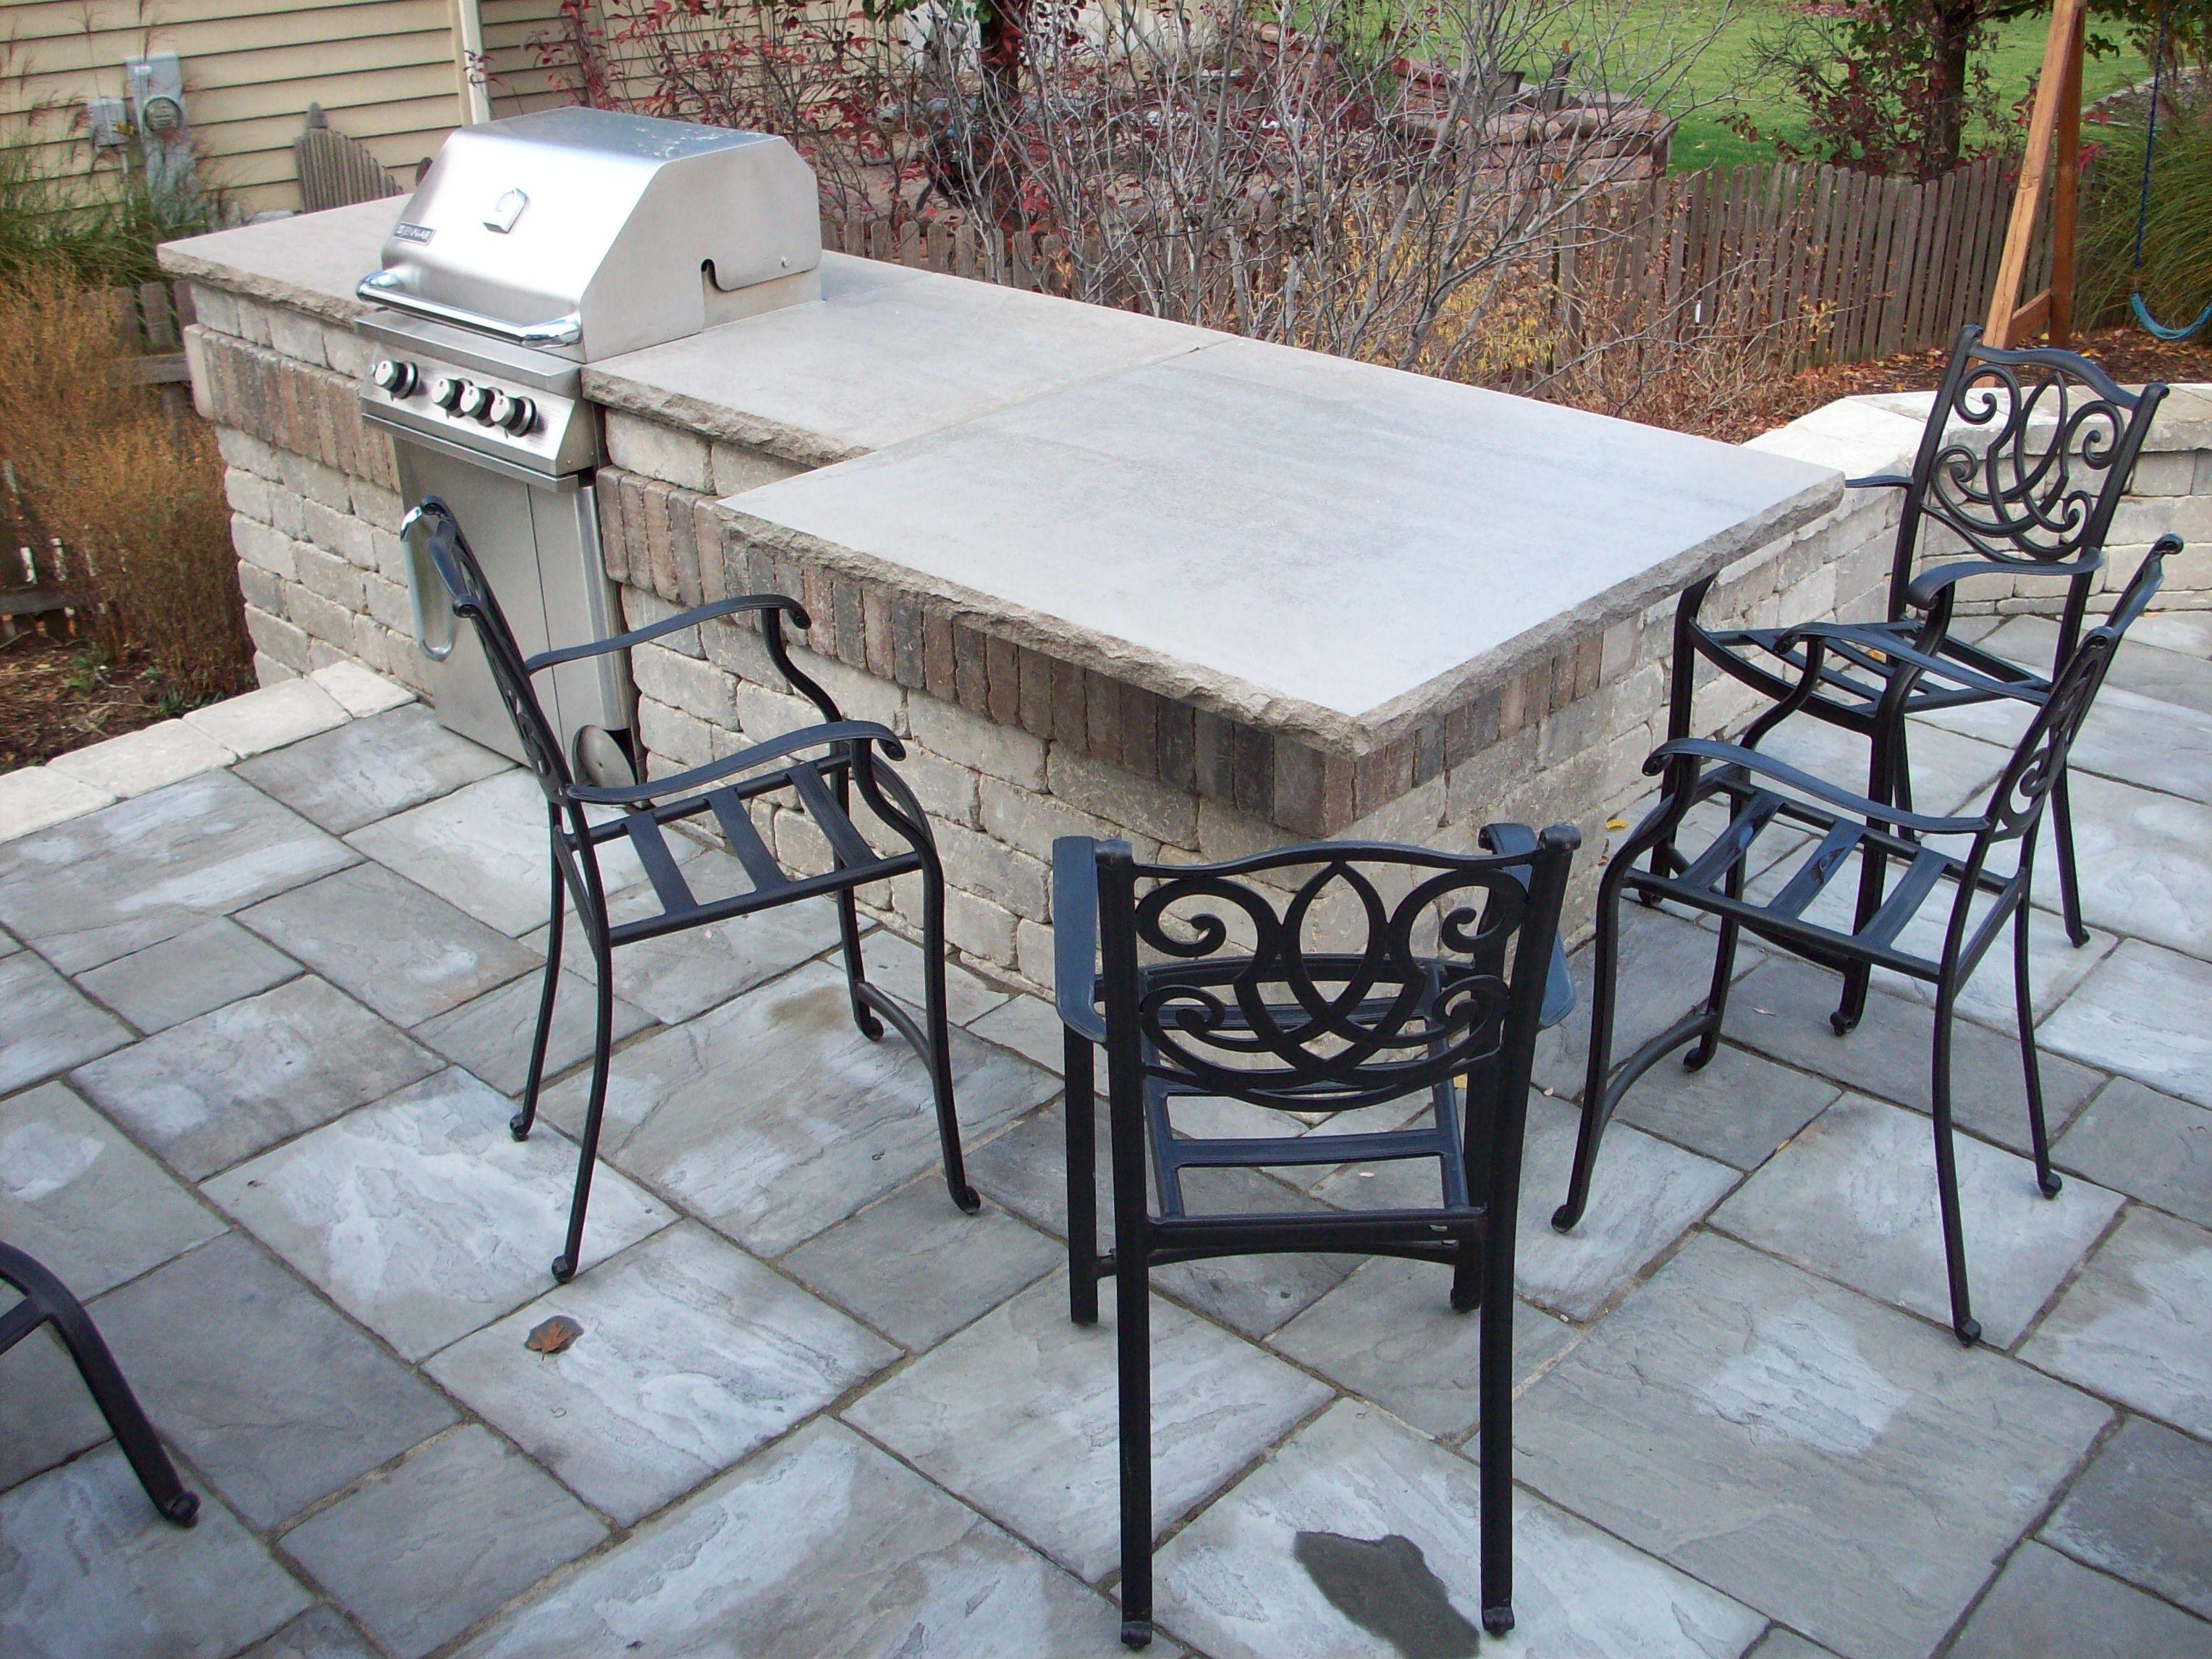 Outdoor Kitchens Unilock Olde Quarry Bbq Limestone Countertop And Unilock Rivenston Limestone Countertops Outdoor Kitchen Countertops Outdoor Kitchen Design